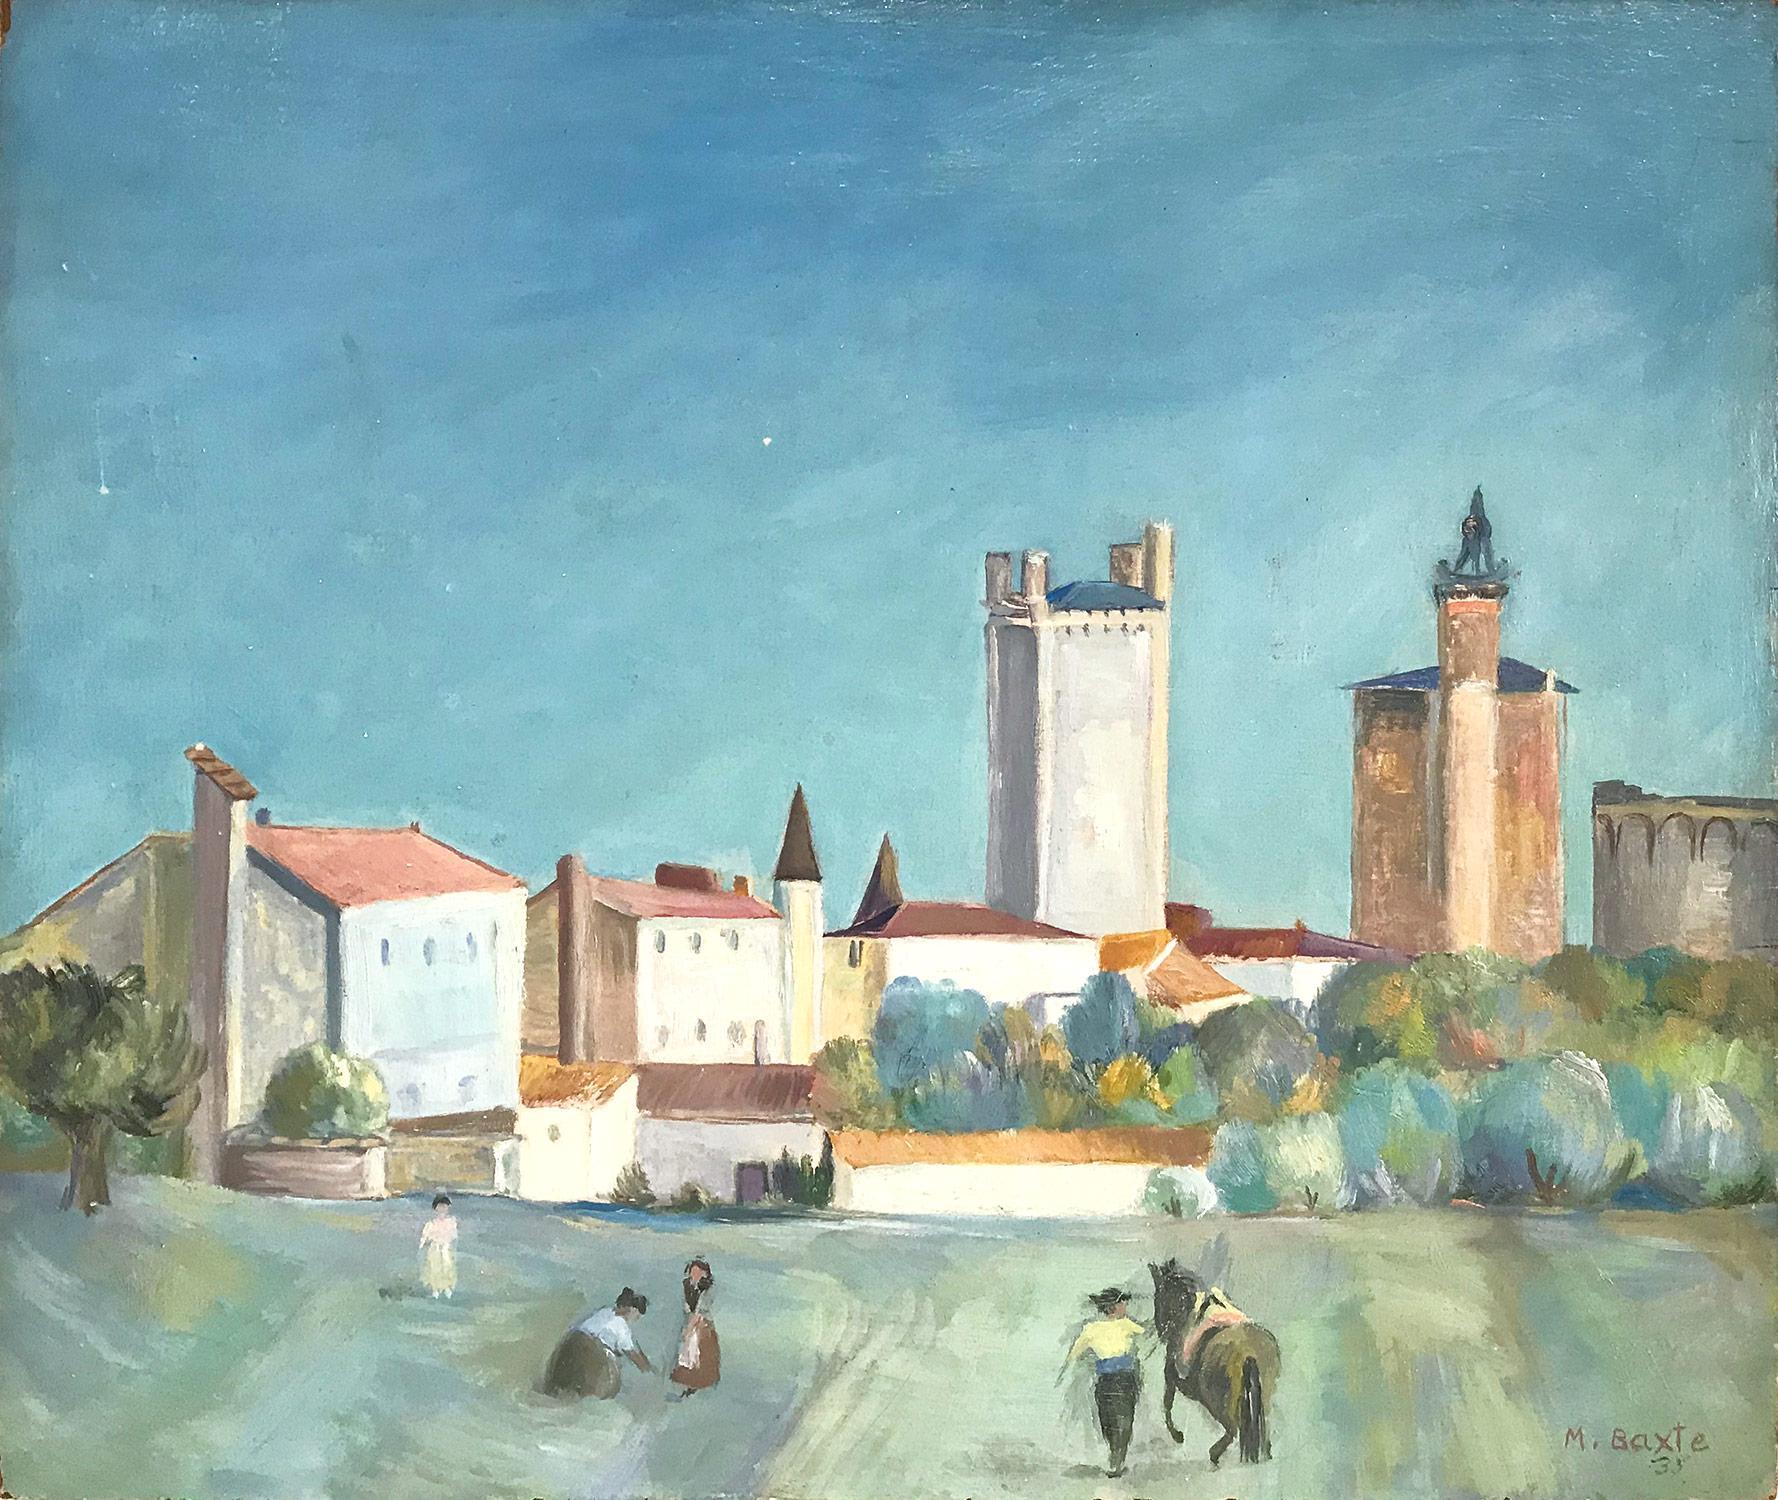 """European Village Landscape Scene"" Modernist Style Painting Oil on Board"